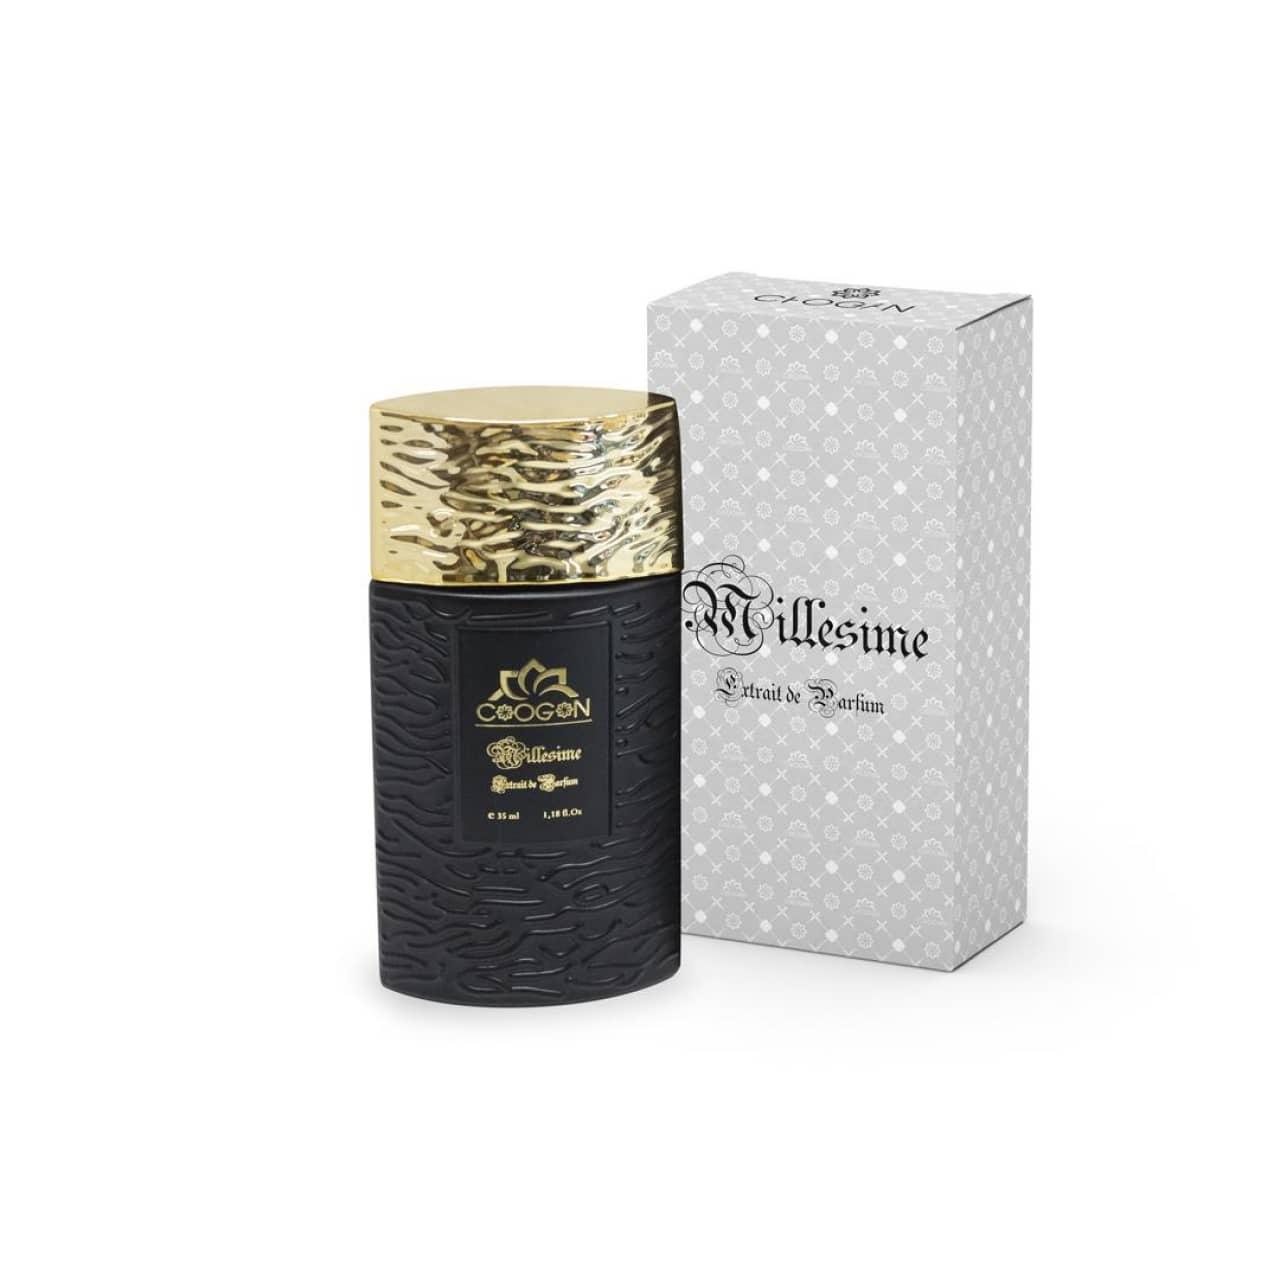 Parfum unisexe réf 044-35ml